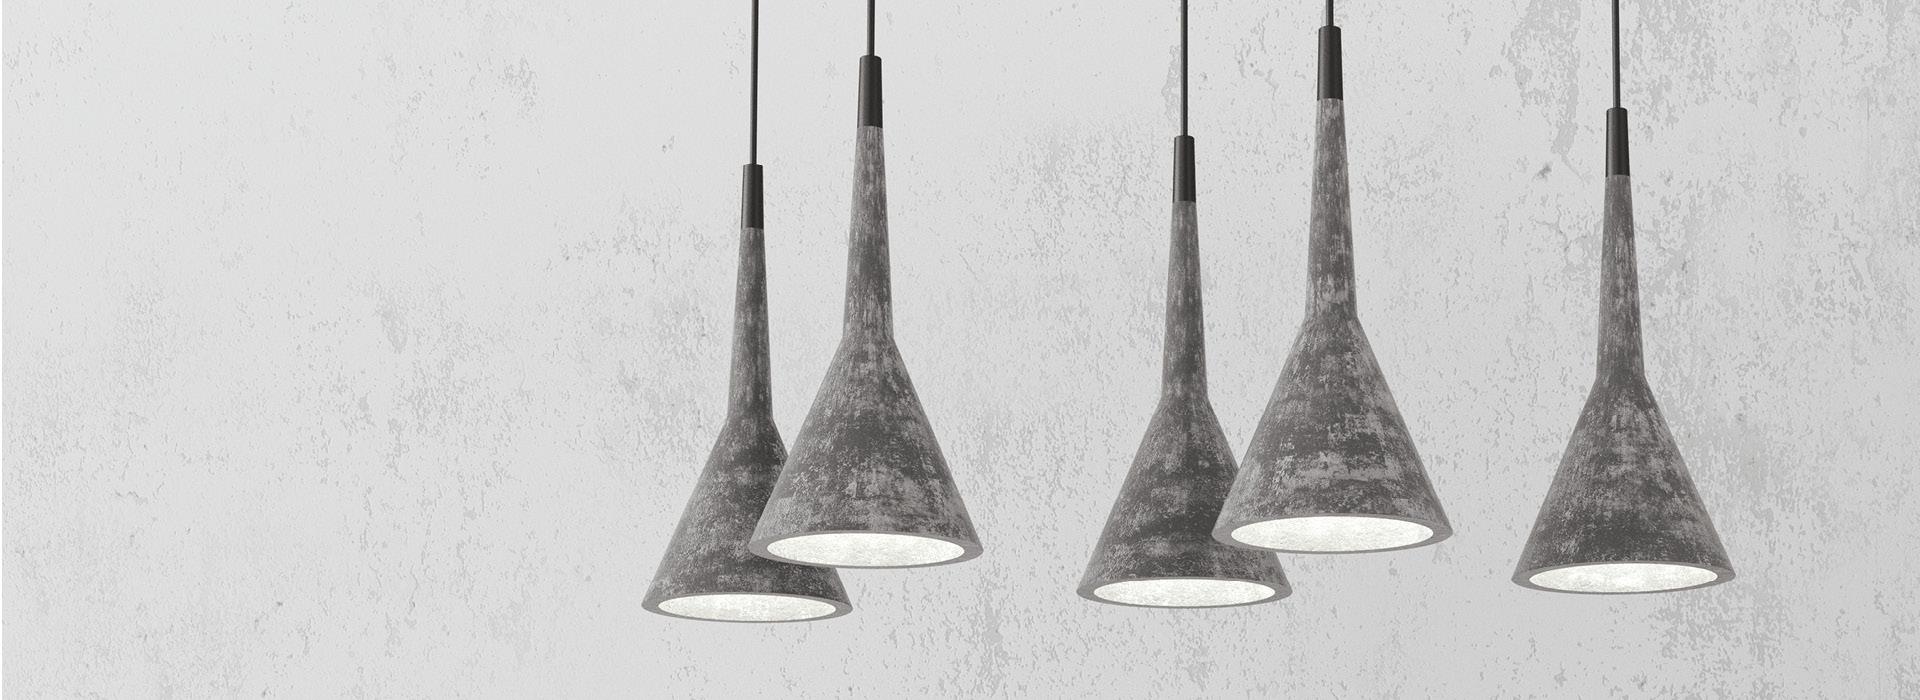 Lampen aus Beton Design, grau, marmoriert